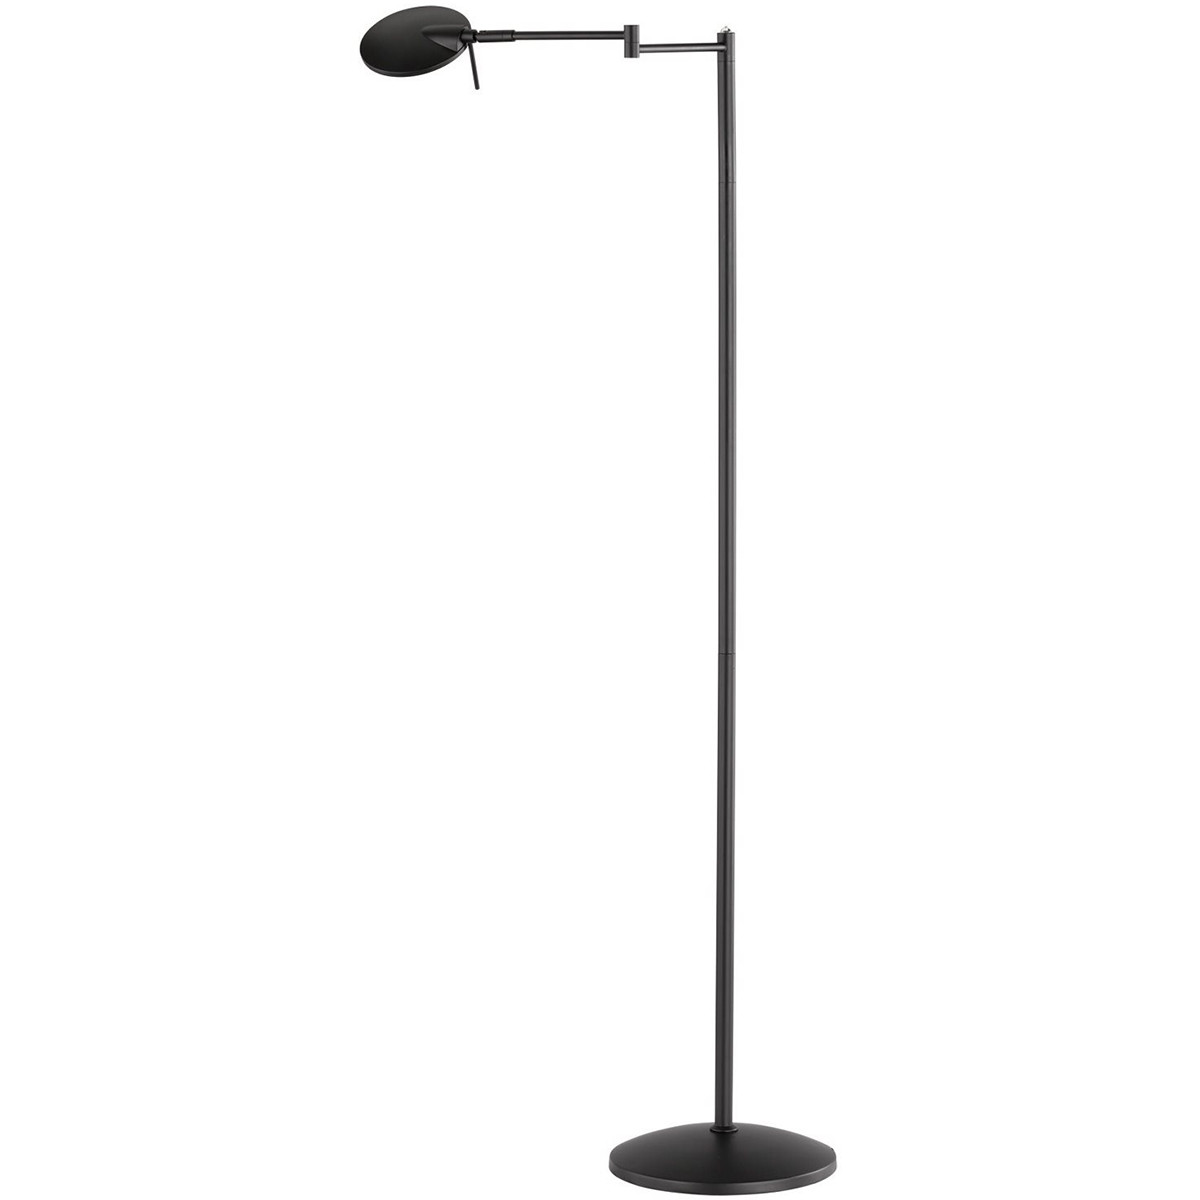 LED Vloerlamp - Trion Kazin - 8W - Warm Wit 3000K - Dimbaar - Rond - Mat Zwart - Aluminium